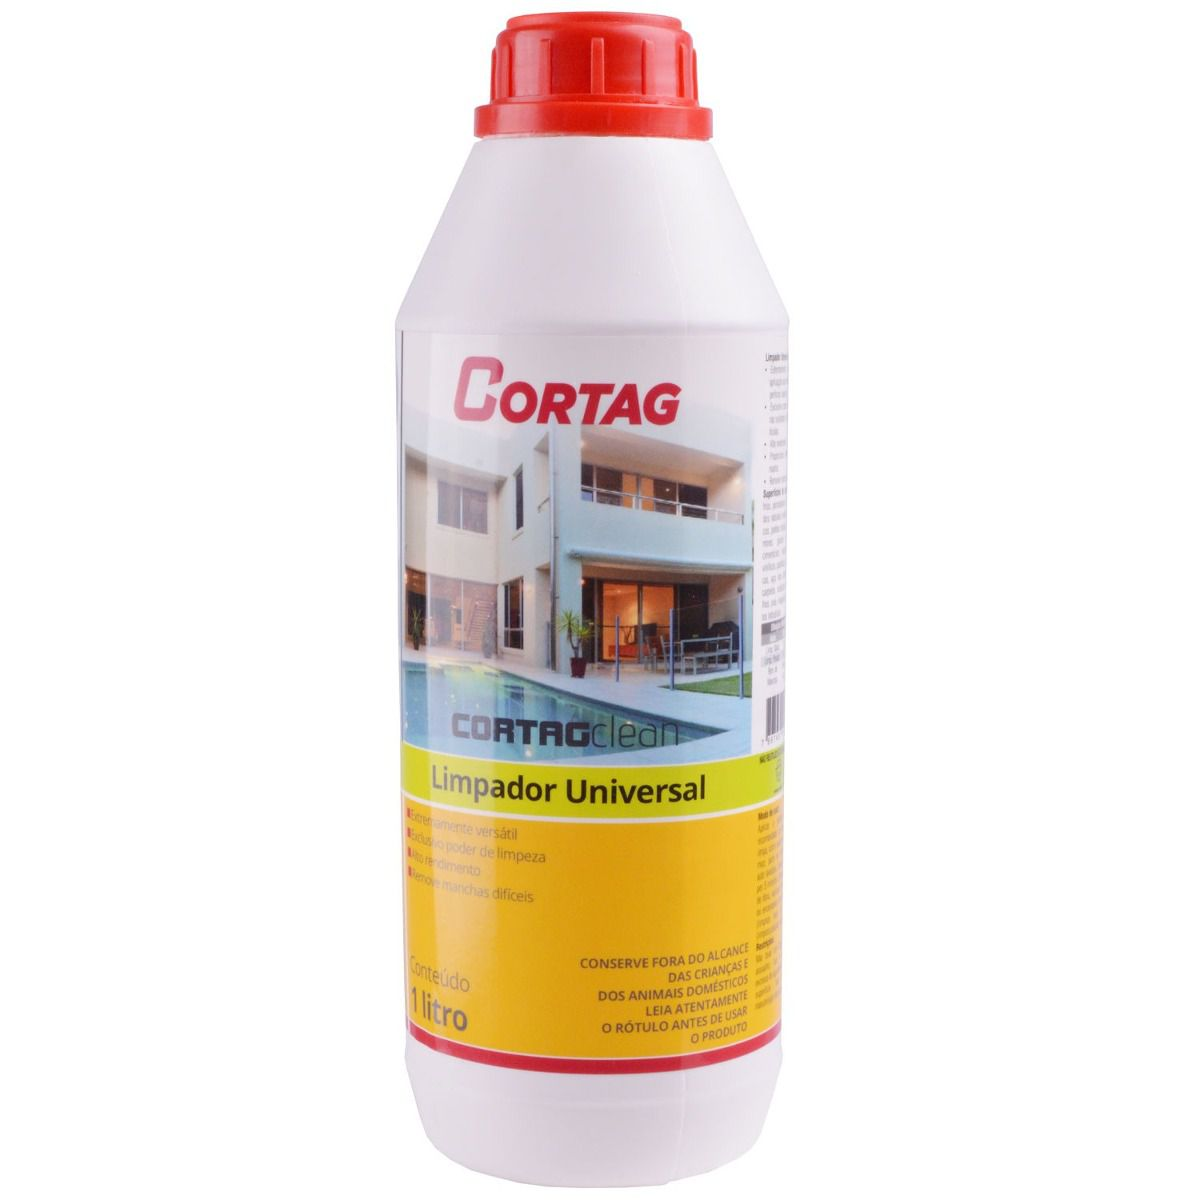 Limpador para porcelanato CortagClean 1L